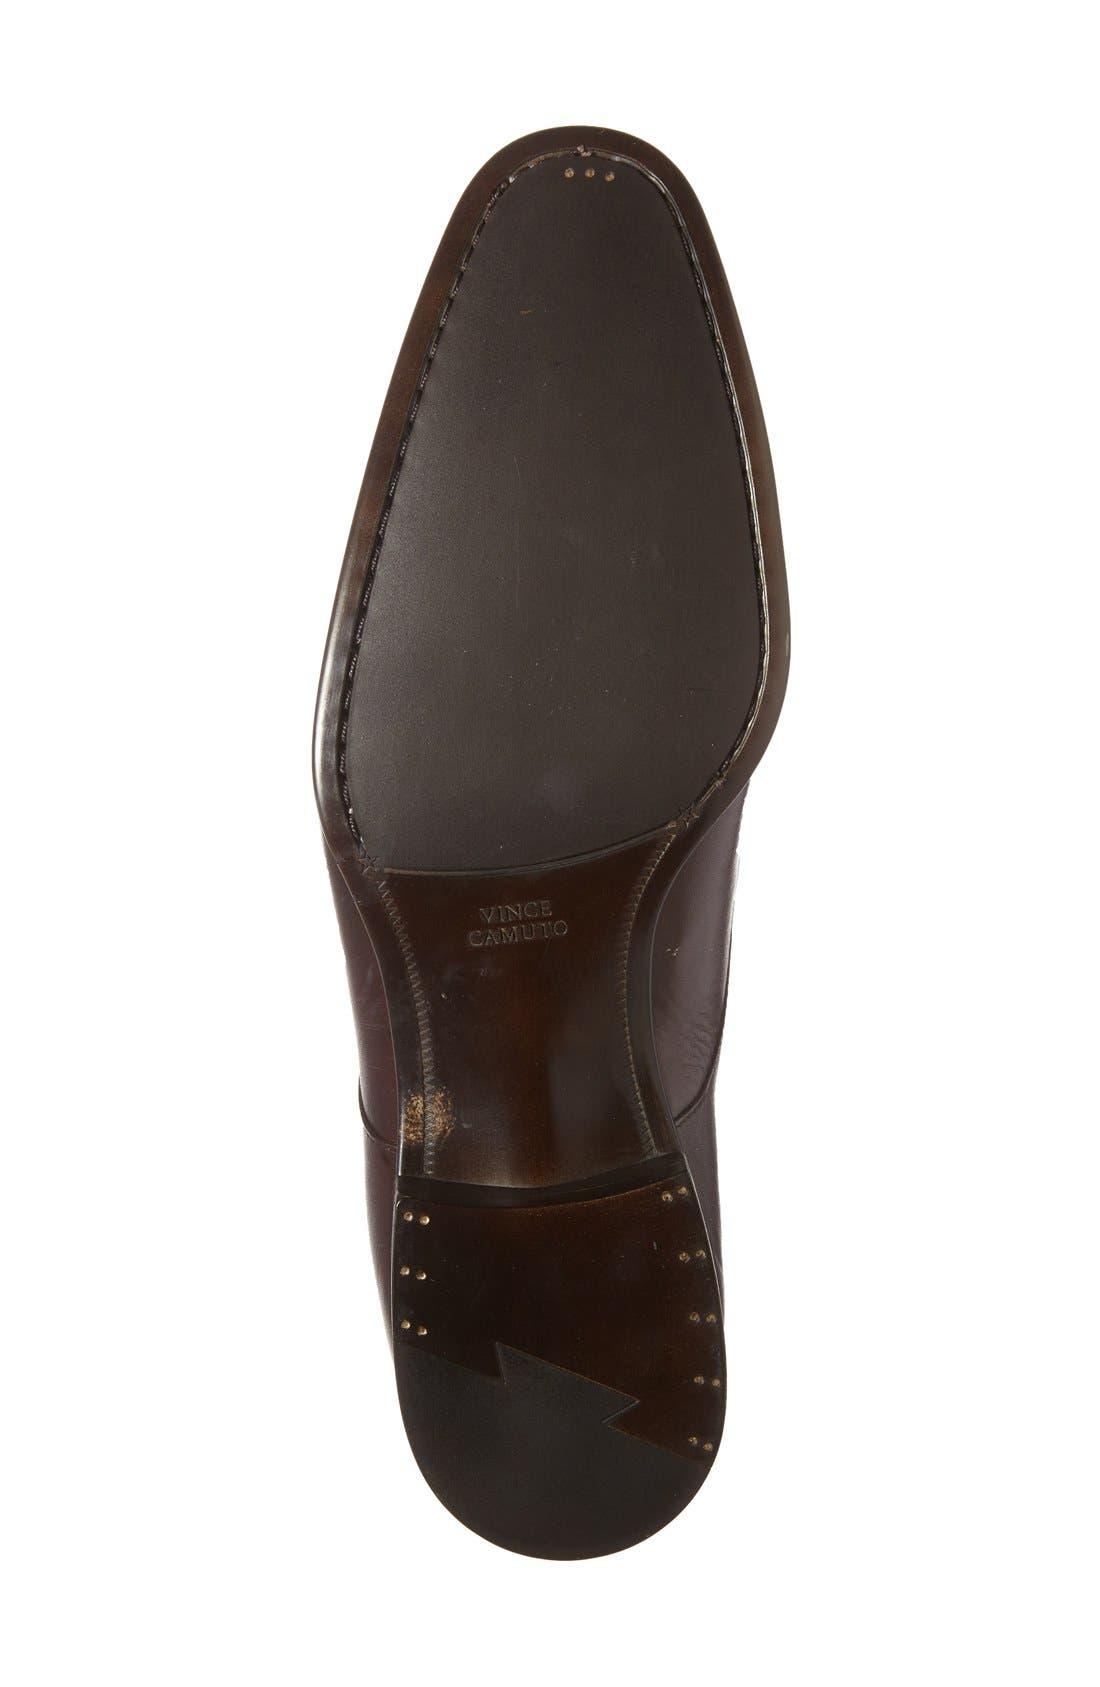 VINCE CAMUTO,                             'Trifolo' Monk Strap Shoe,                             Alternate thumbnail 4, color,                             DARK WOODBURY LEATHER